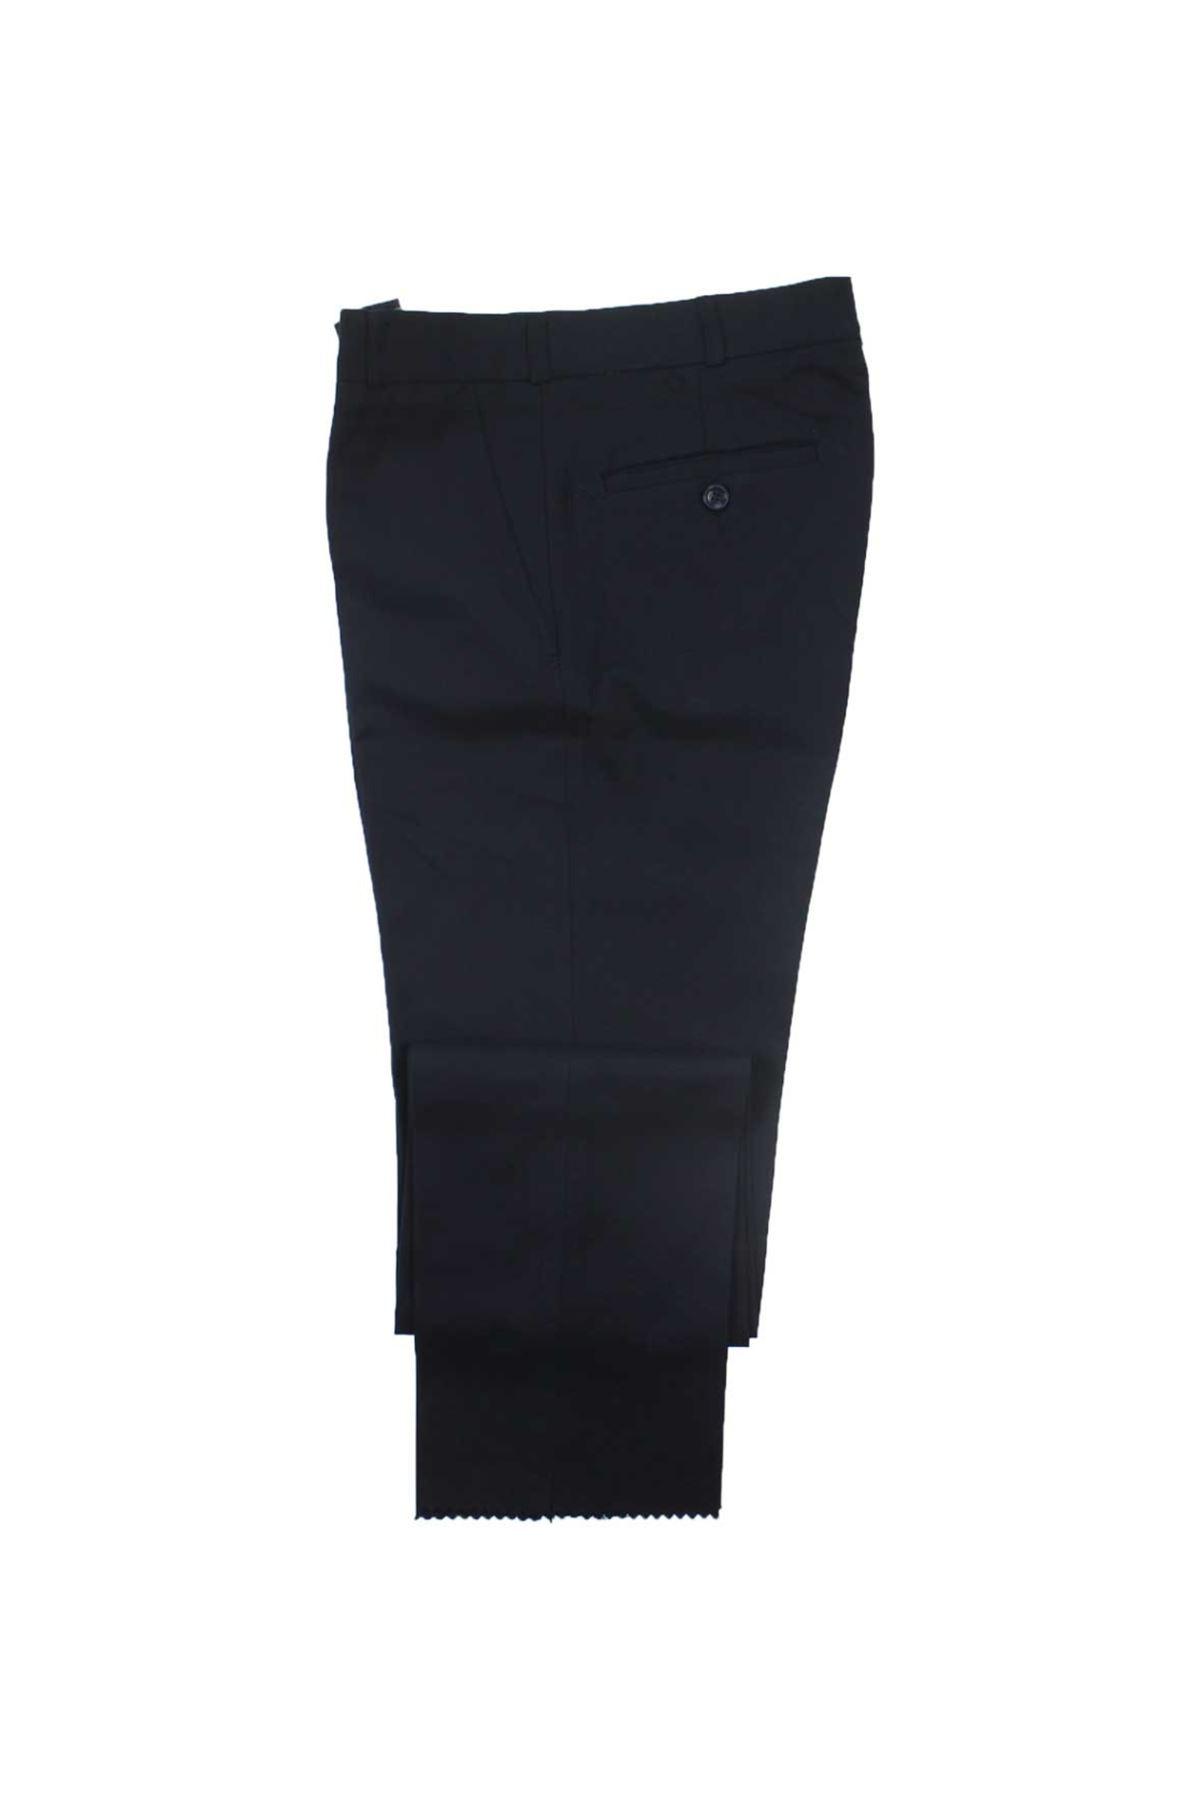 Modakids Erkek Çocuk Lise Lacivert Pantalon